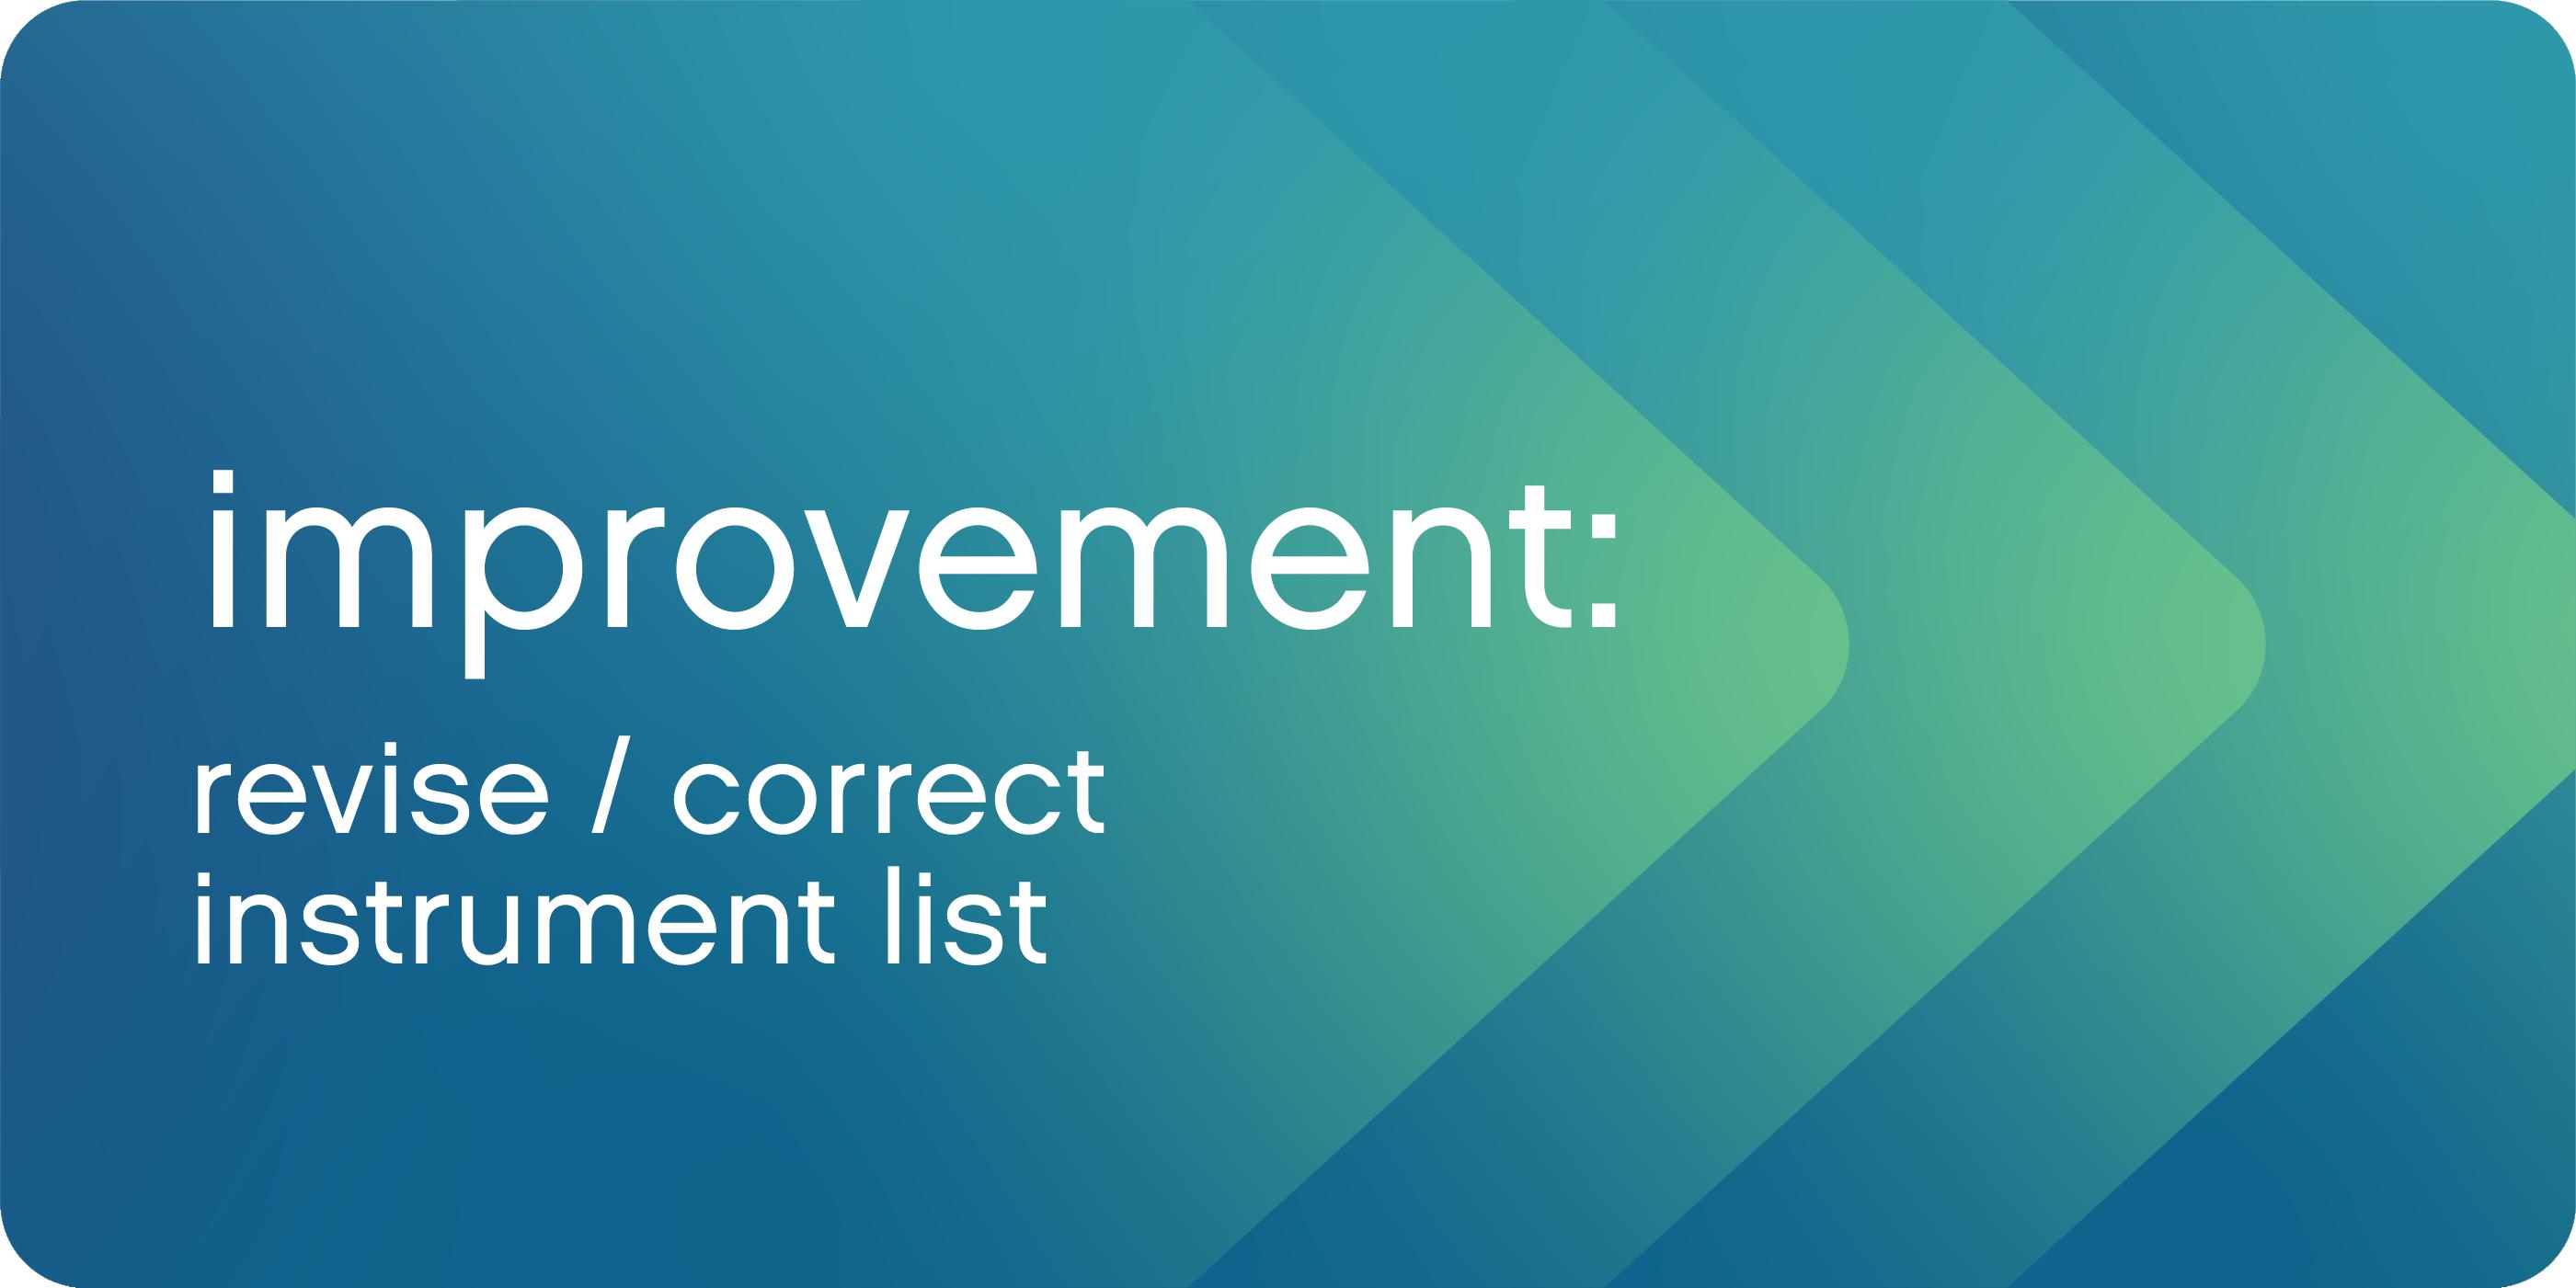 corrected instrument list